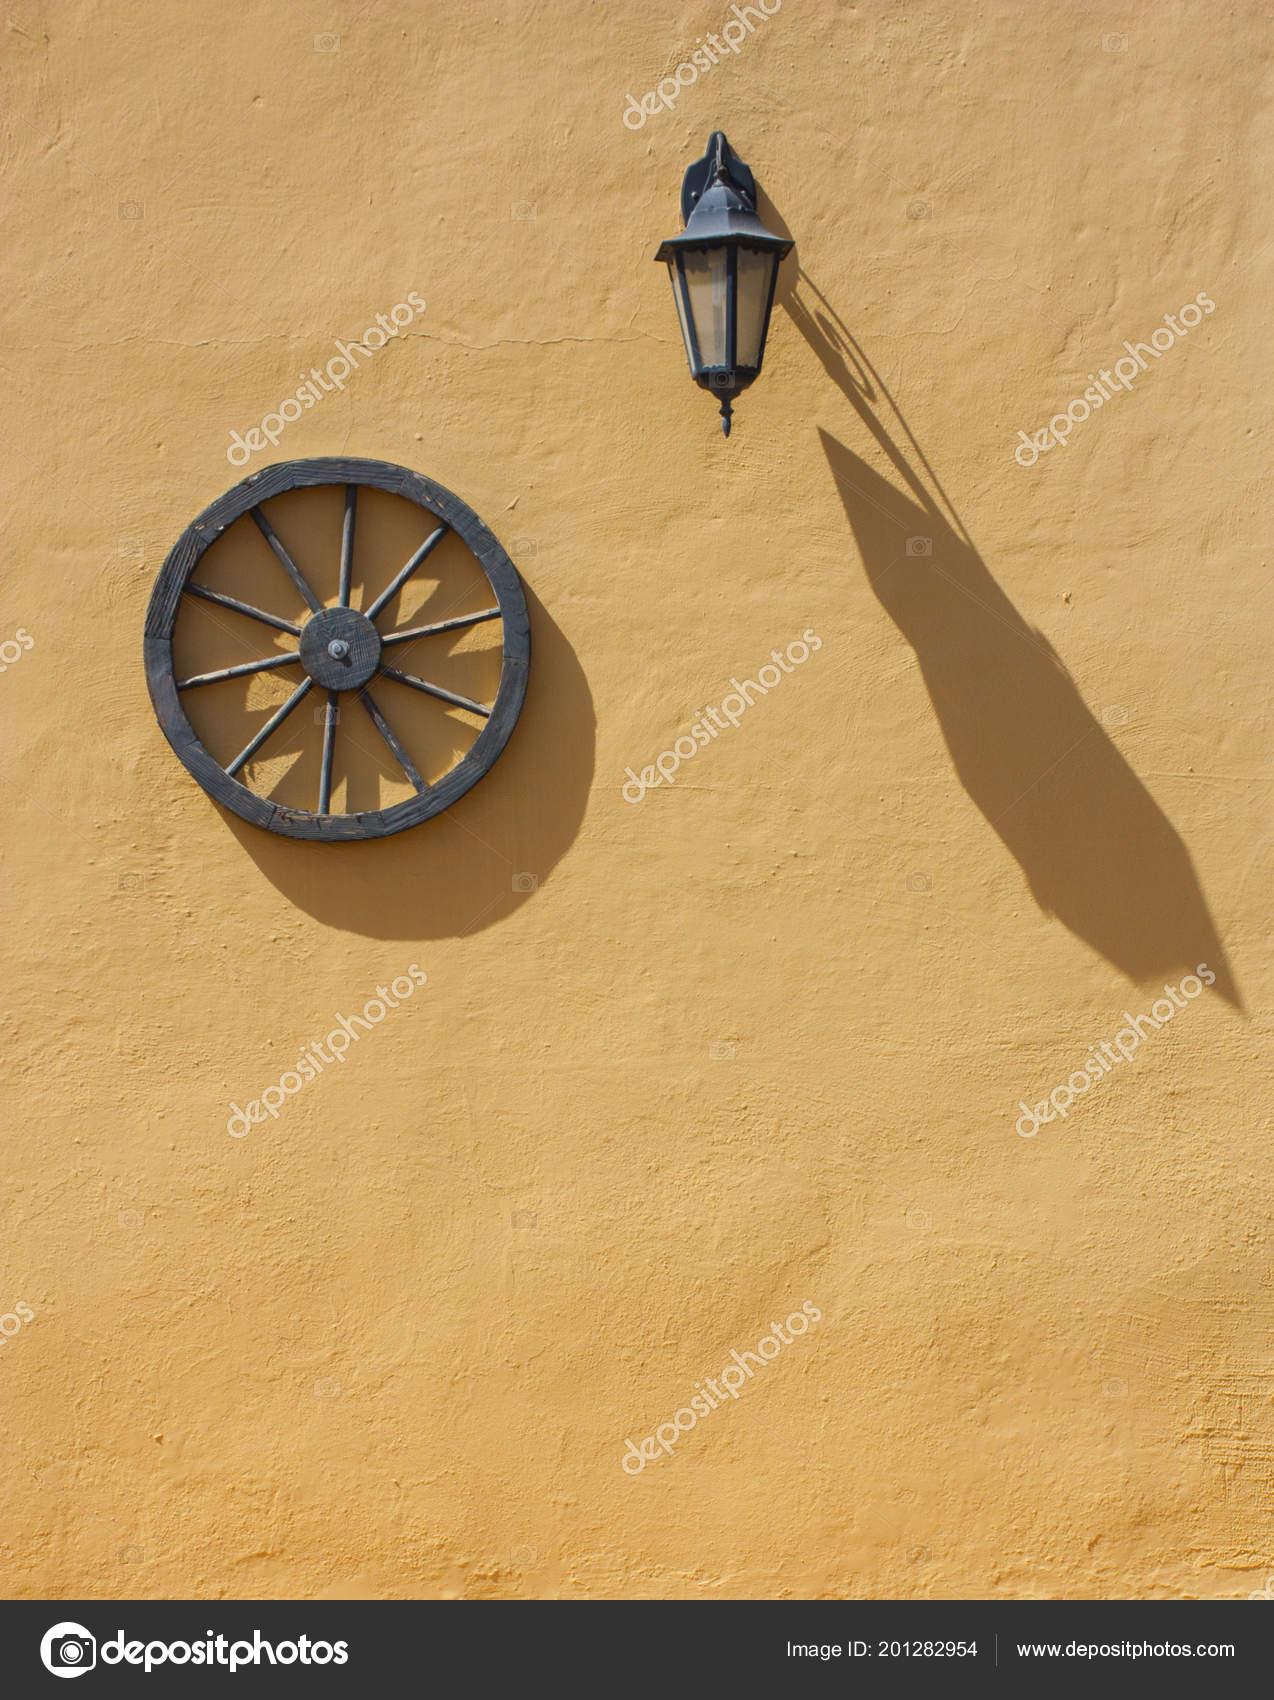 Vintage Old Exterior House Decoration Wooden Wheel Lantern Orange ...